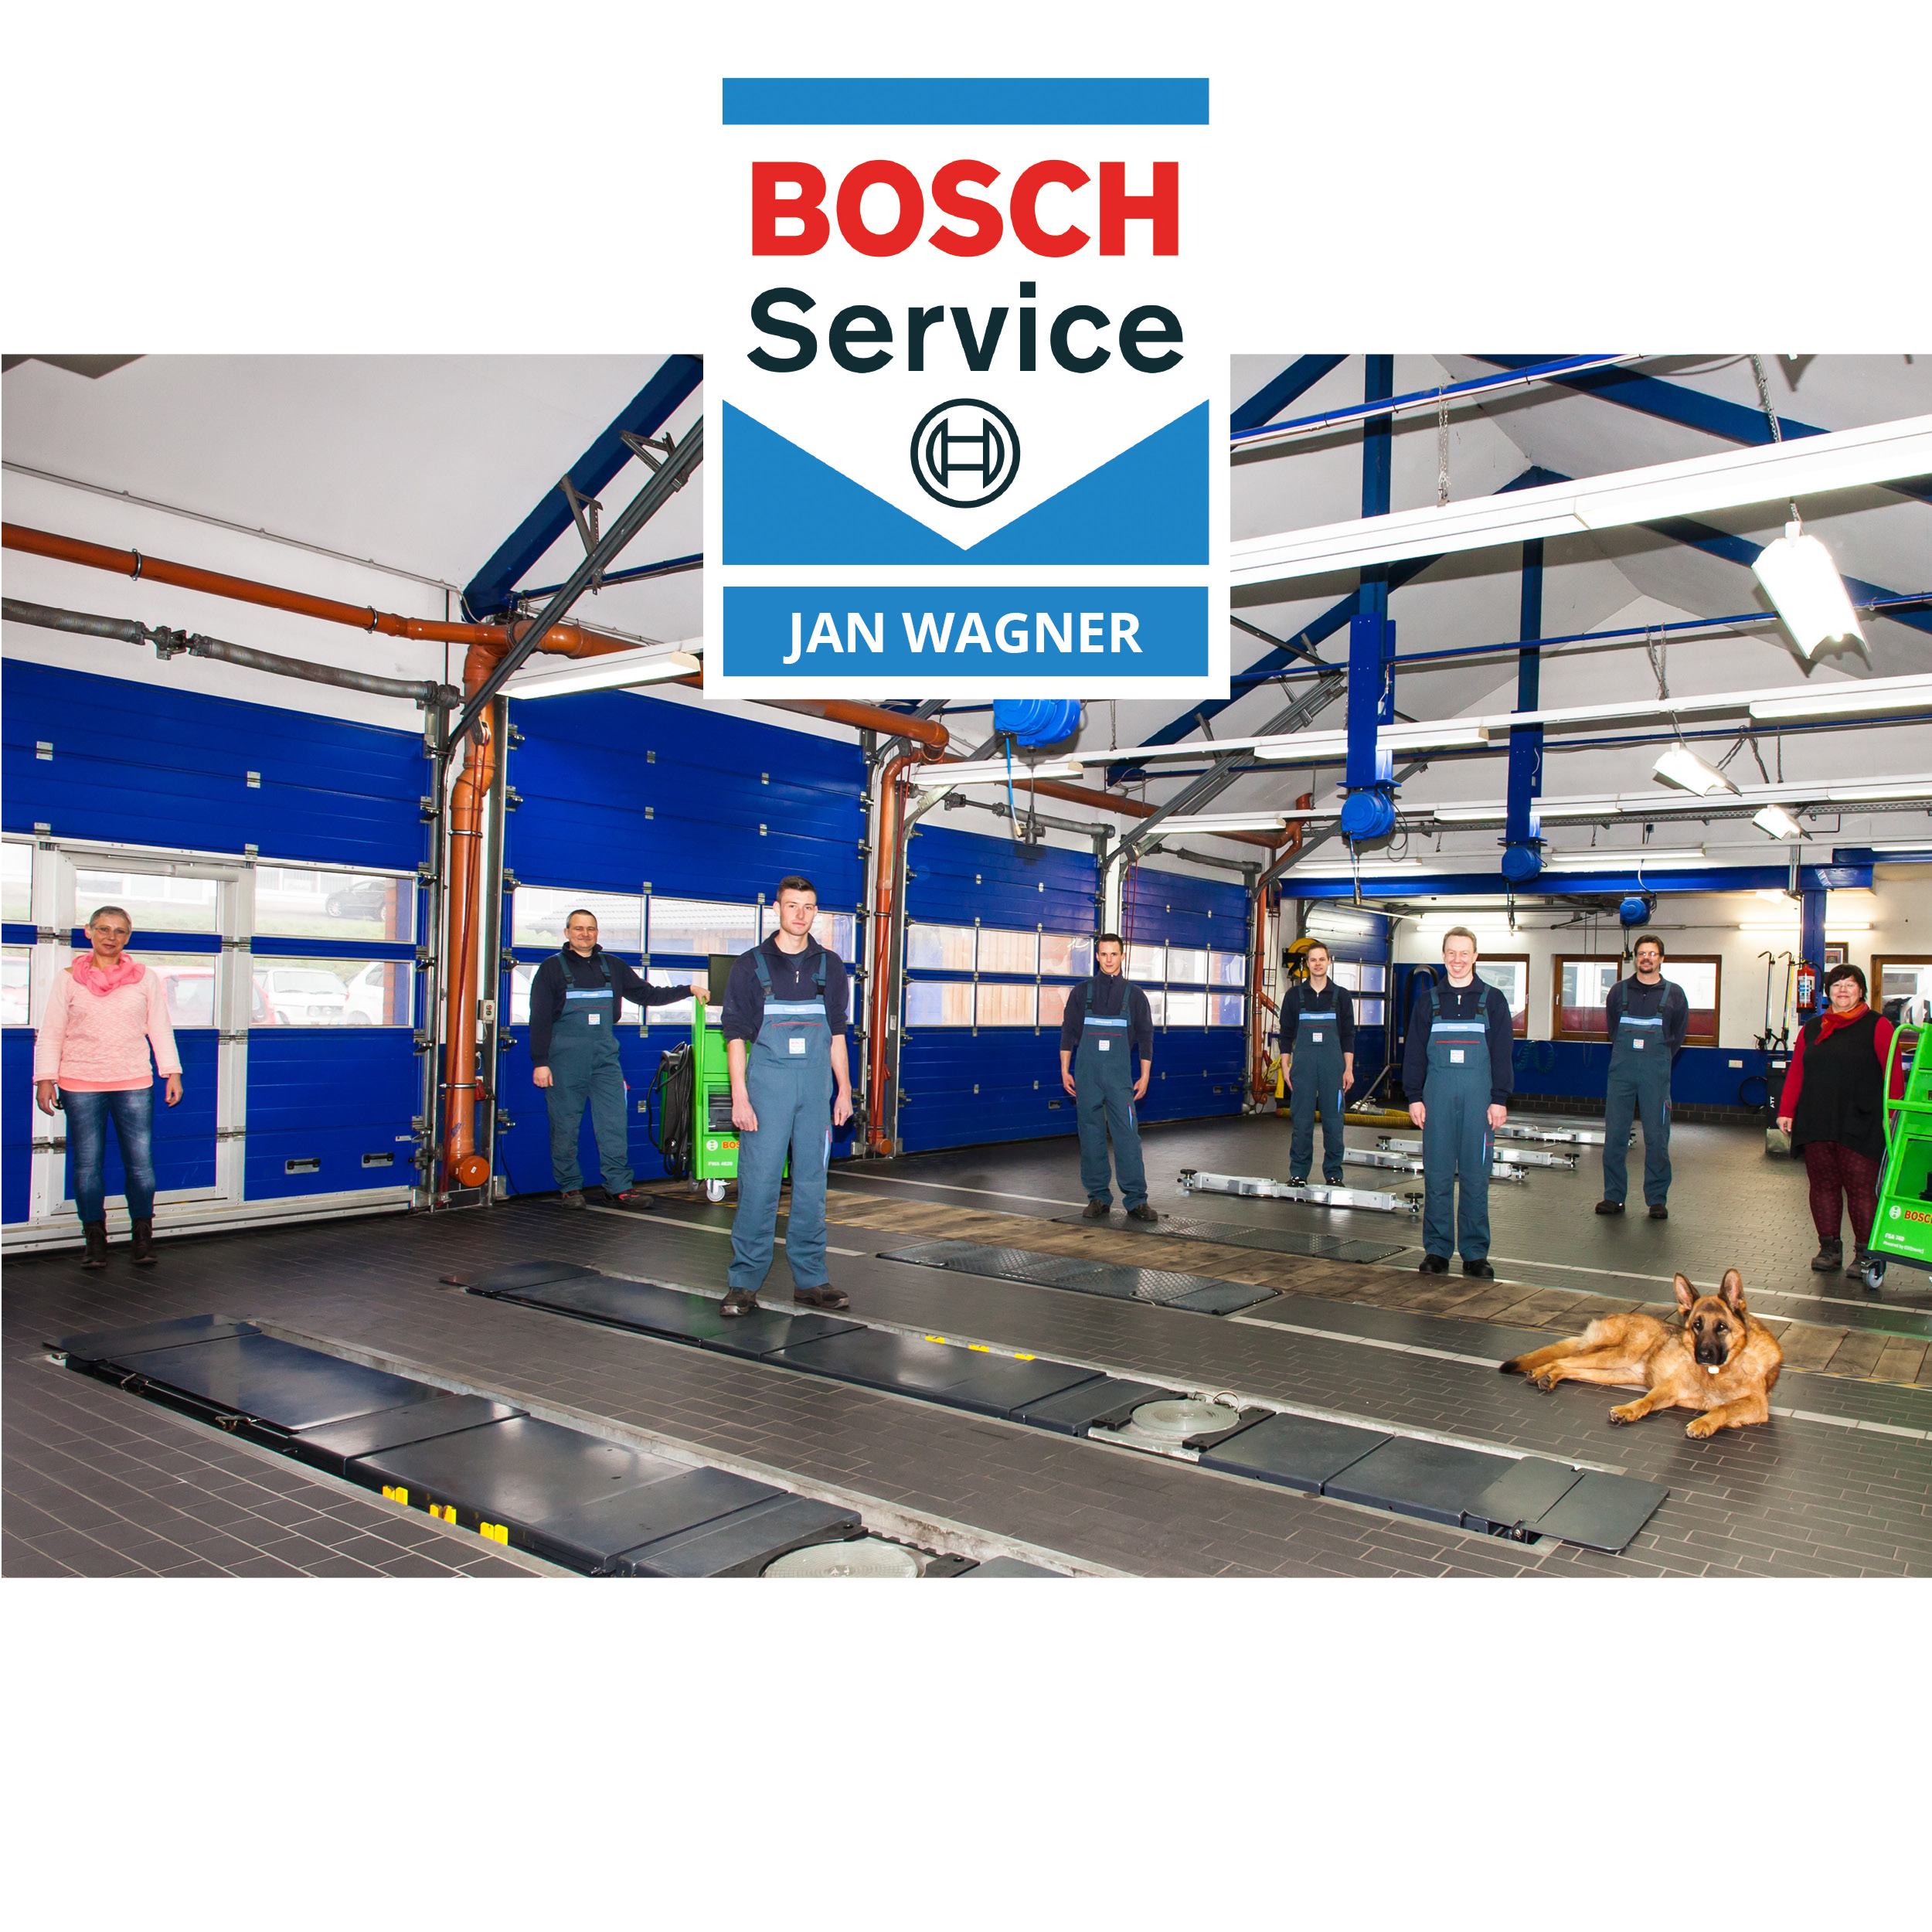 Bosch Service Jan Wagner